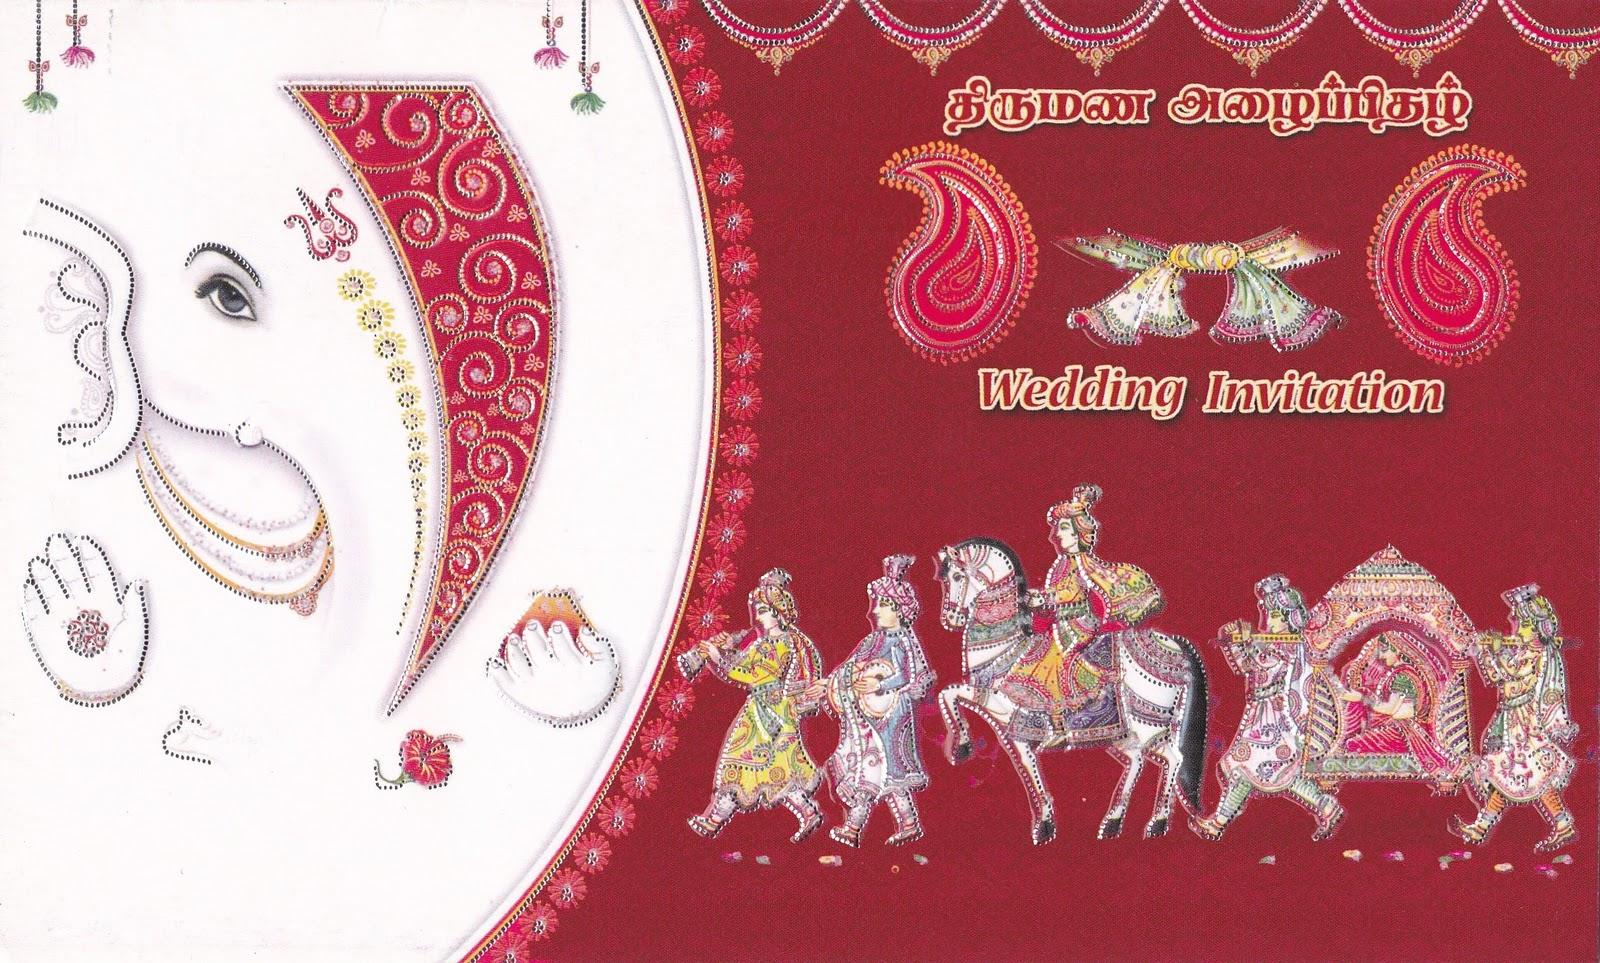 wedding invitation printing johor bahru - popular wedding